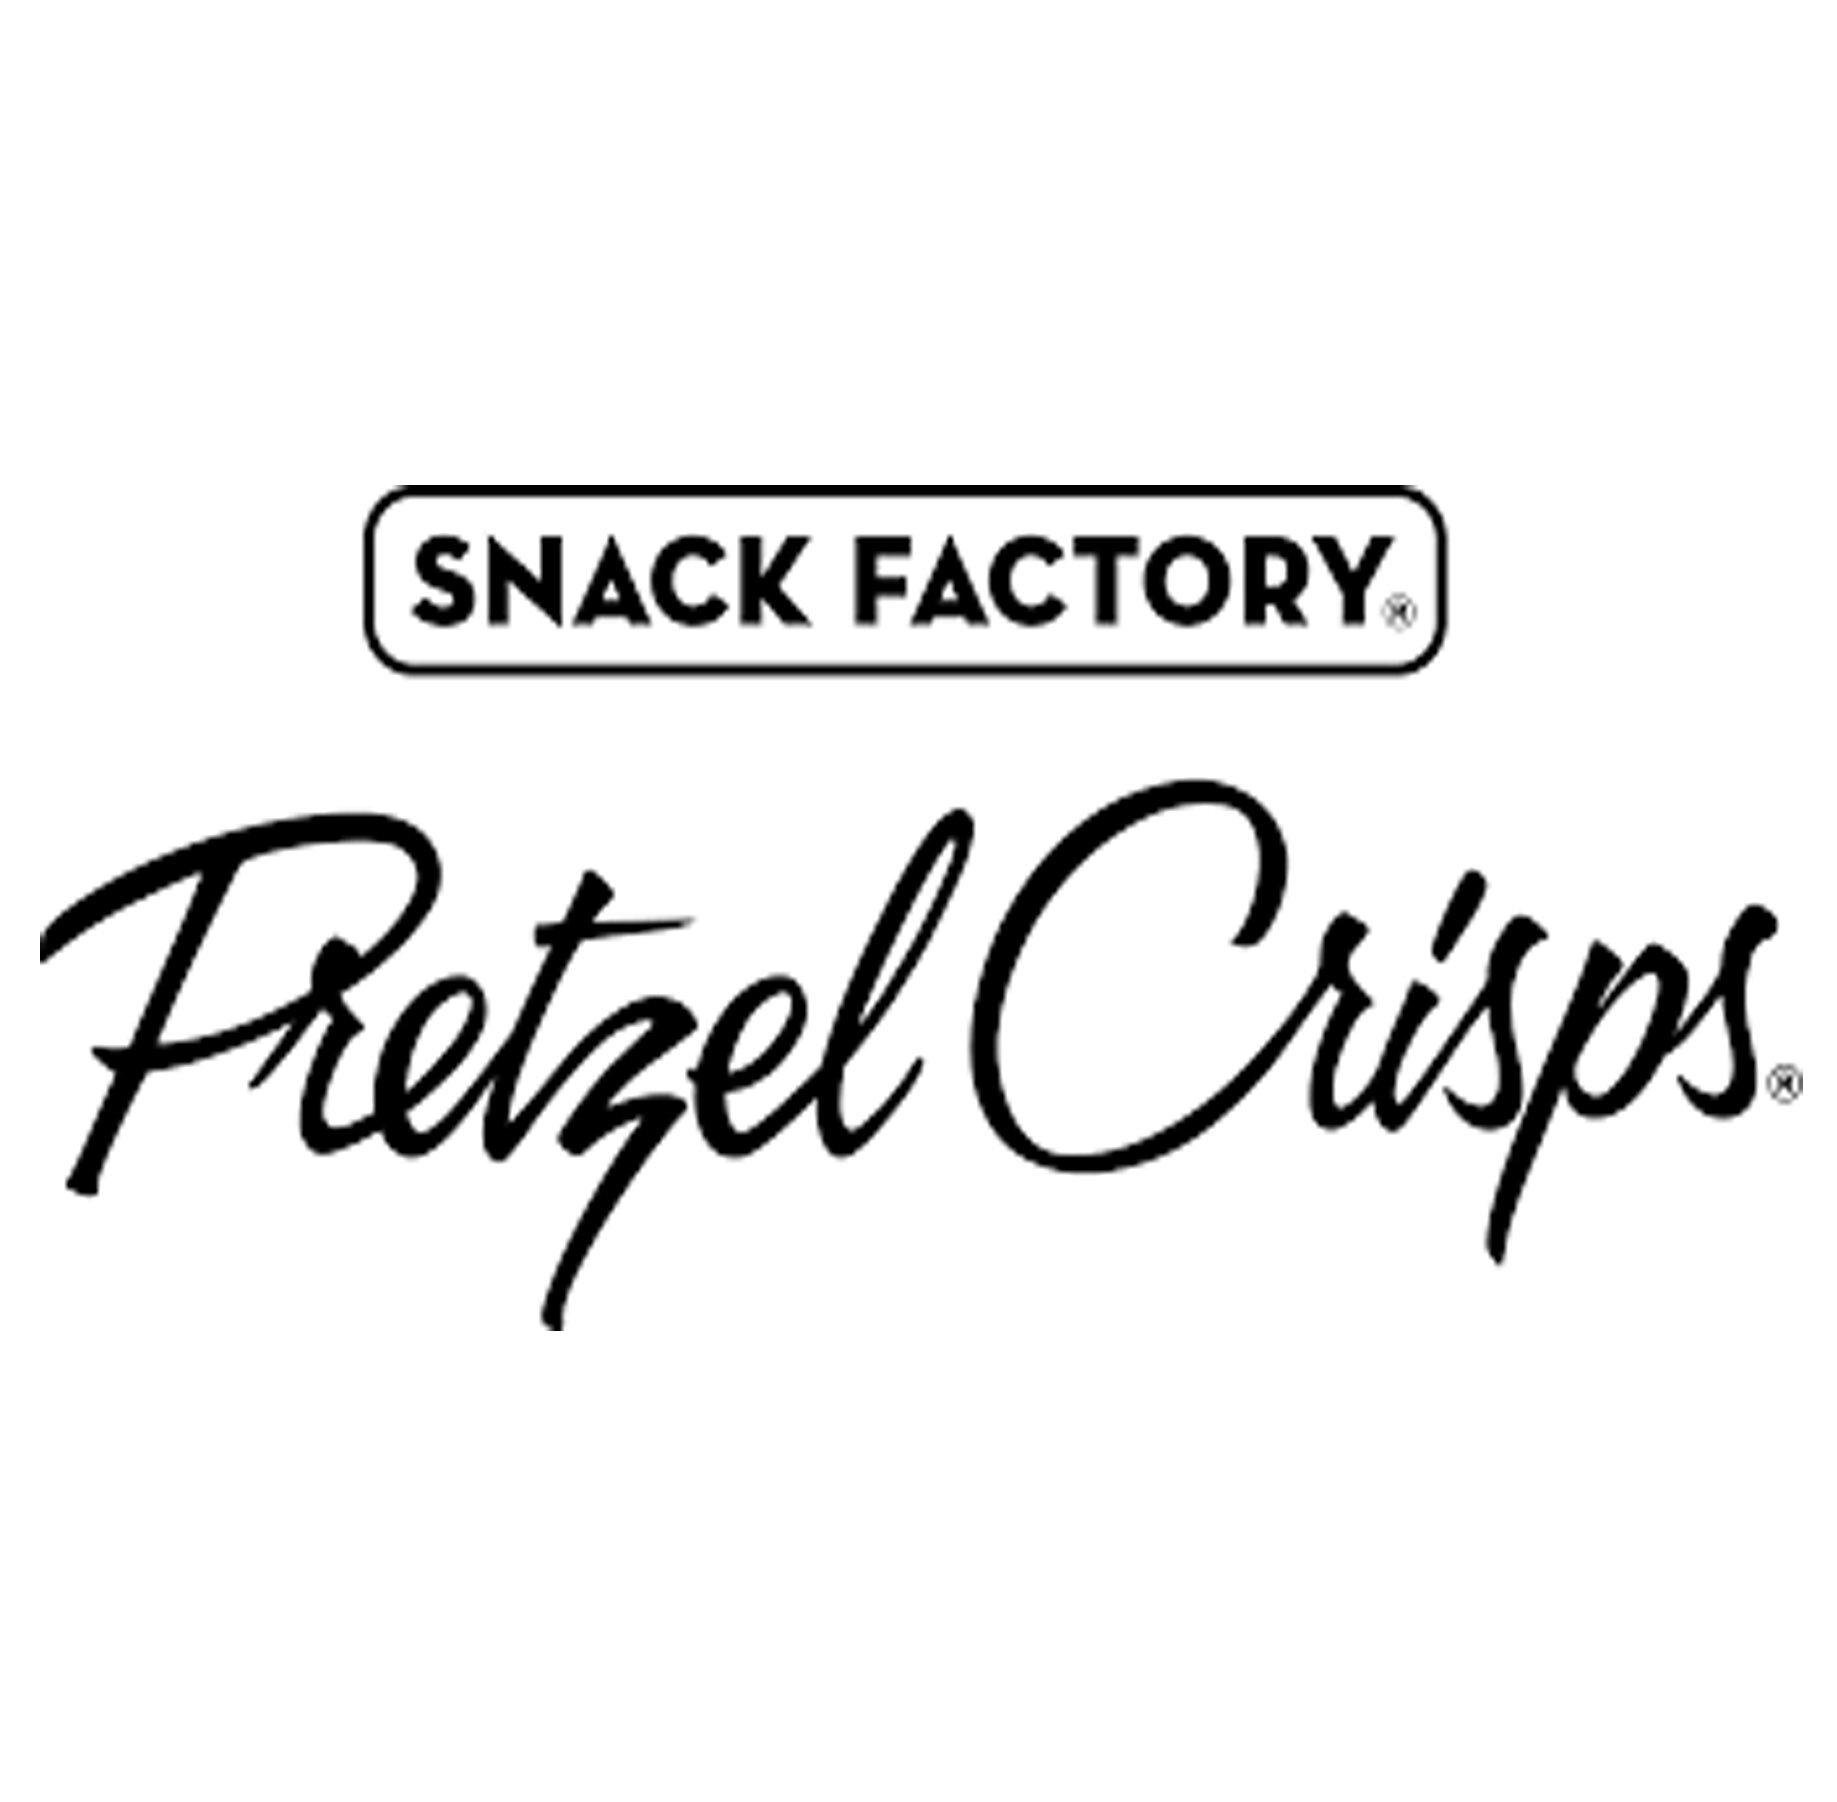 pretzelcrisps.jpg